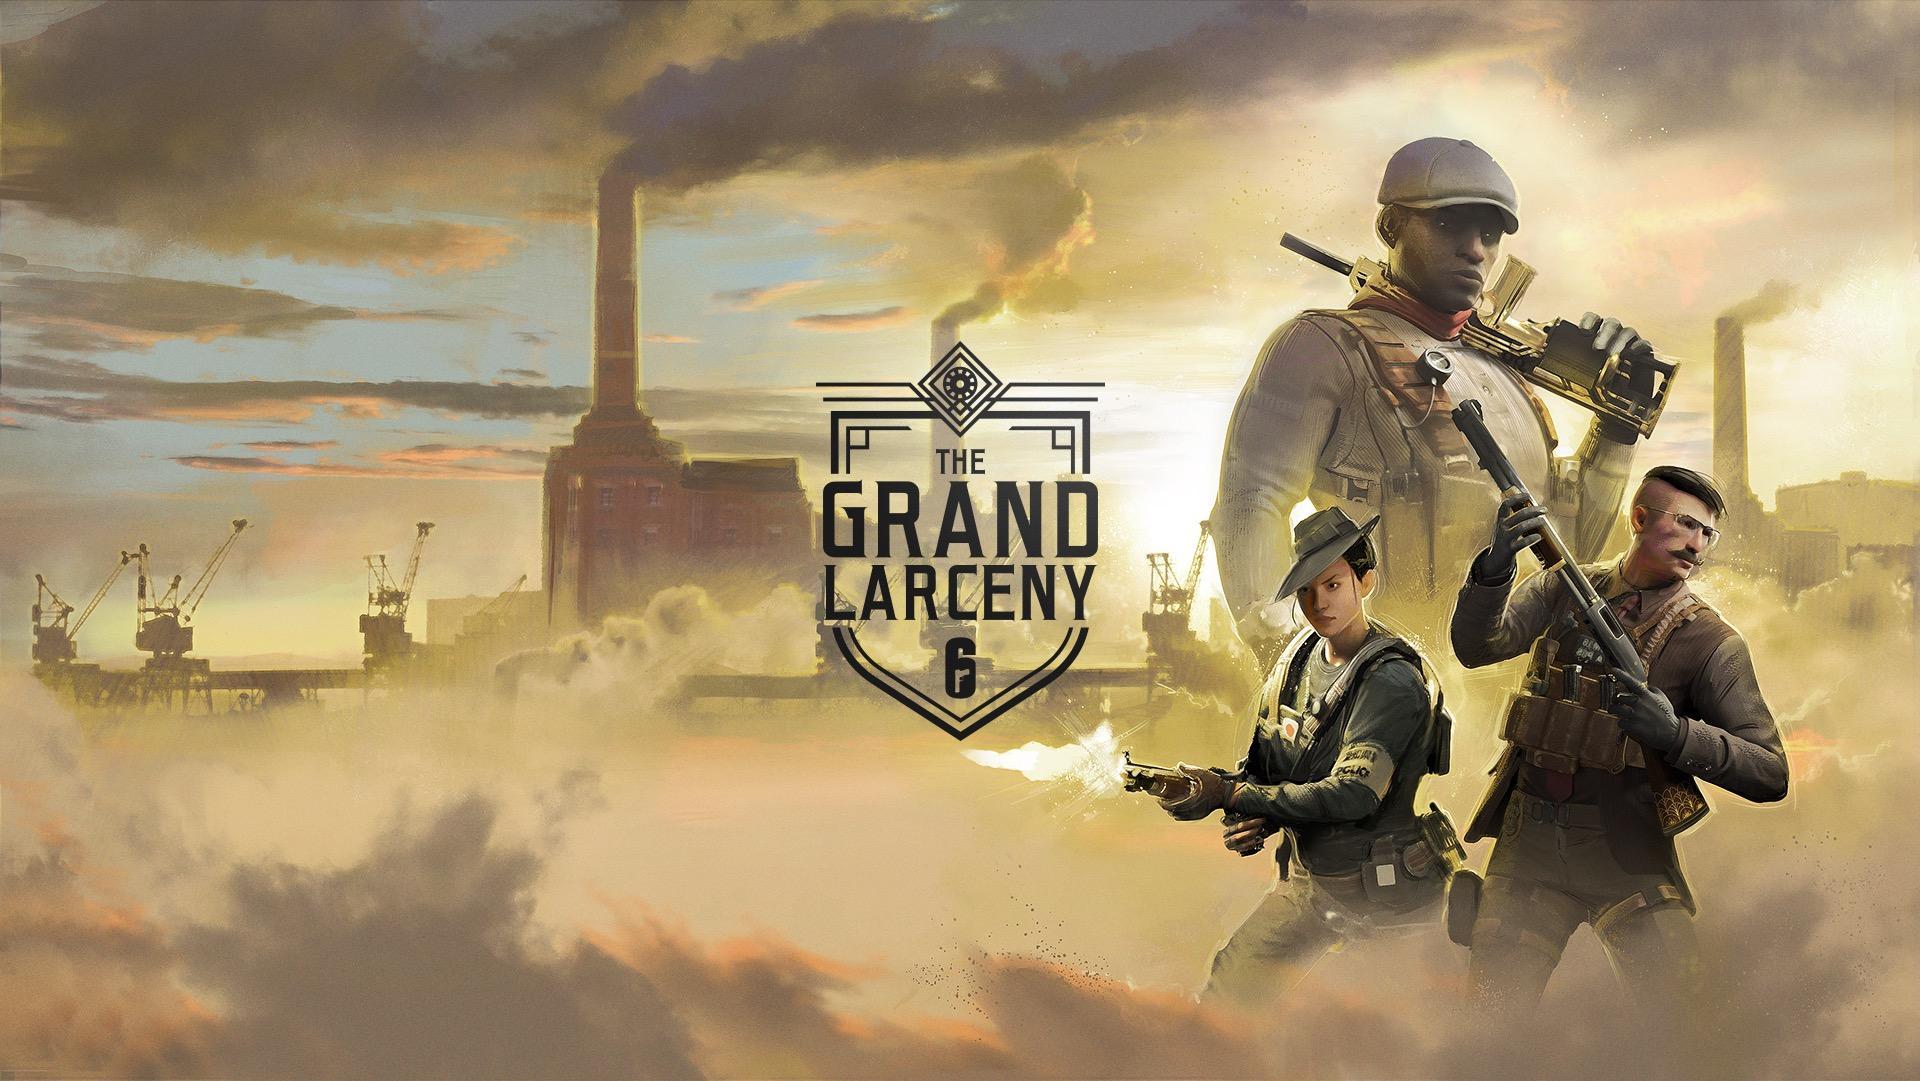 Rainbow Six Siege 'The Grand Larceny' gang event now live